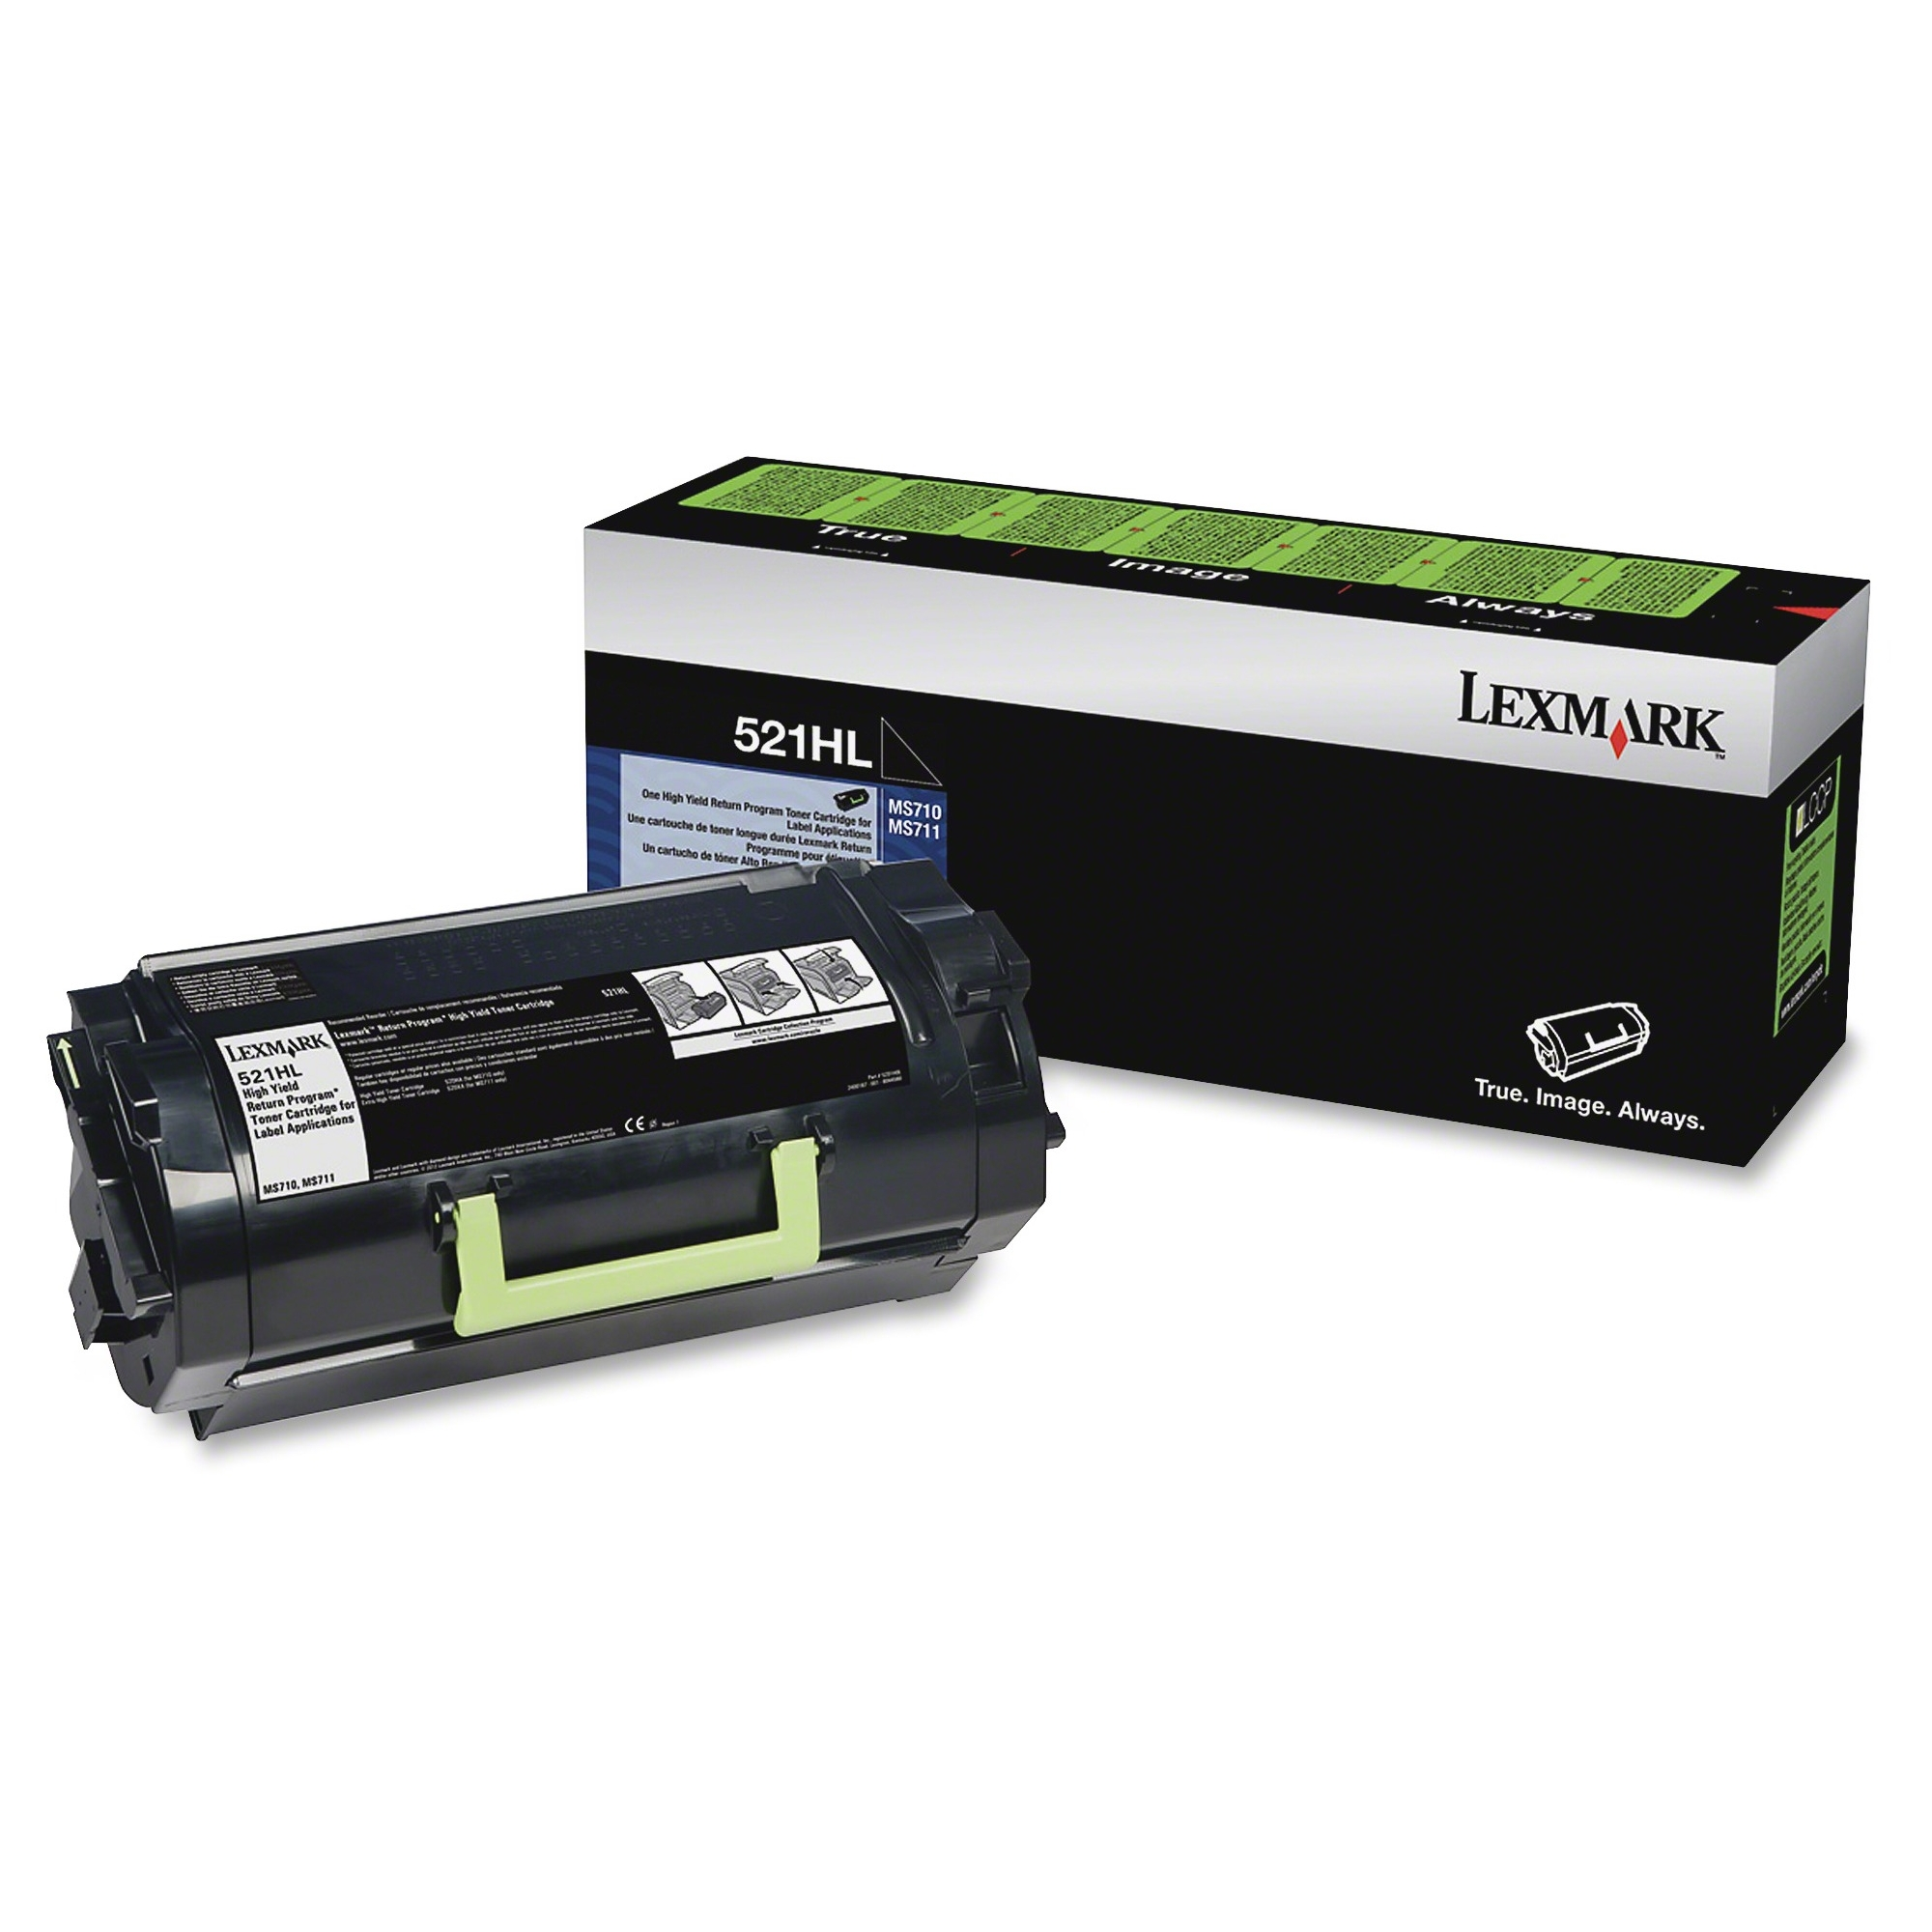 521HL MS710 MS711 High Yield Return Program Toner Cartridge for Label Applications (25000 Yield)